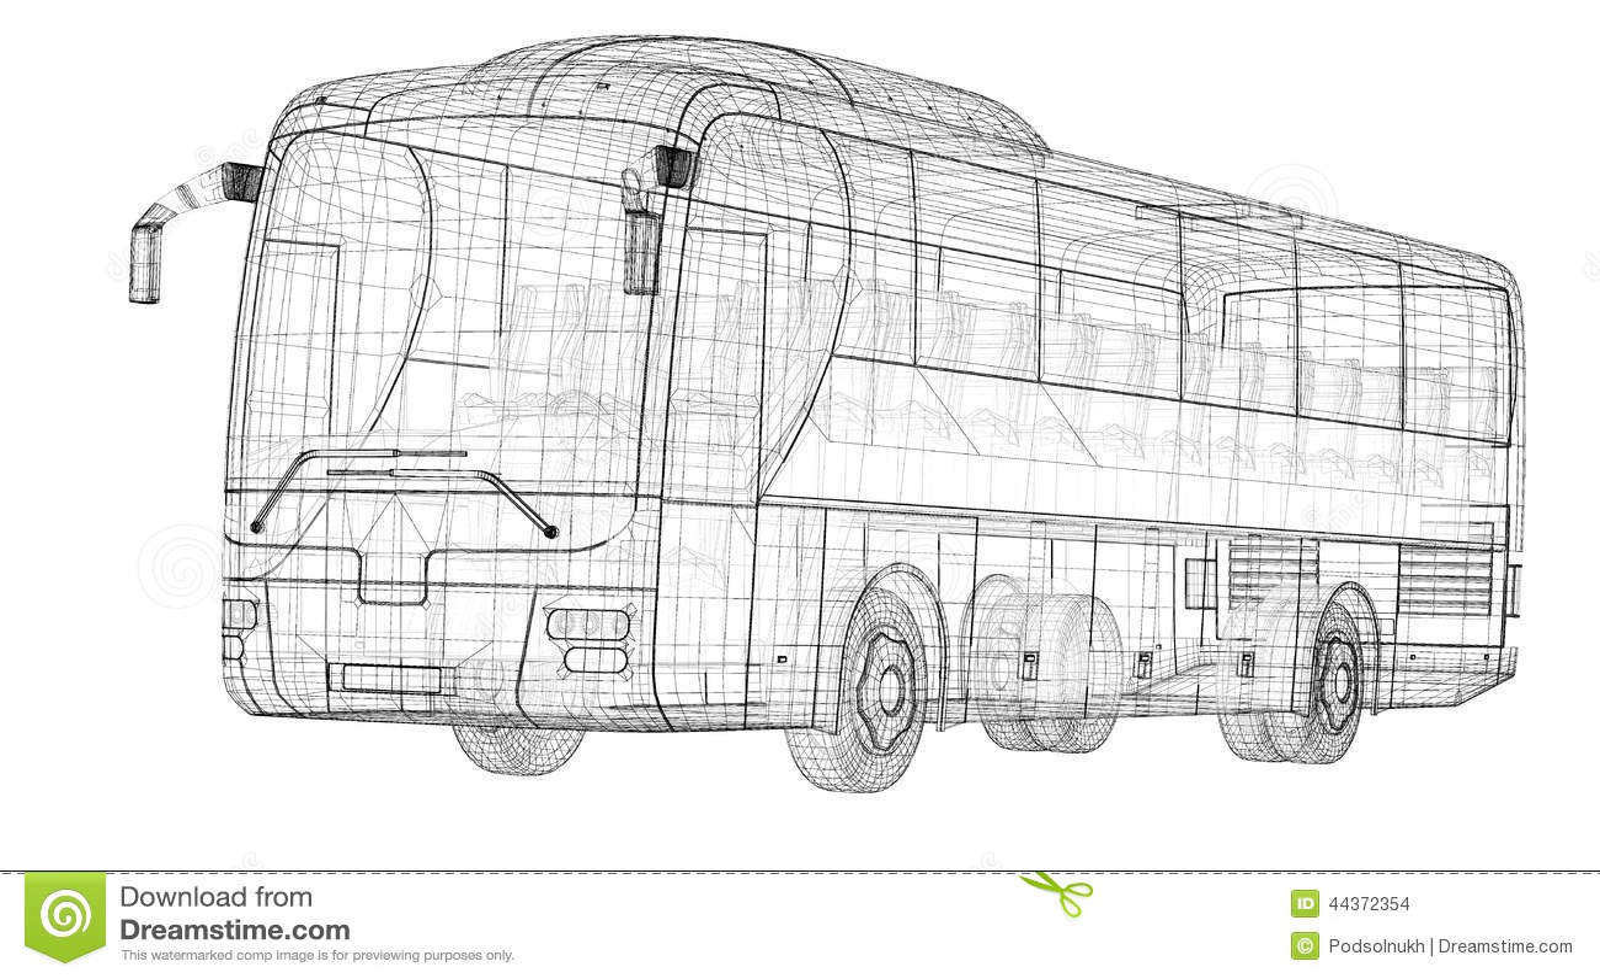 Autobus stock illustration. Illustration of image, life